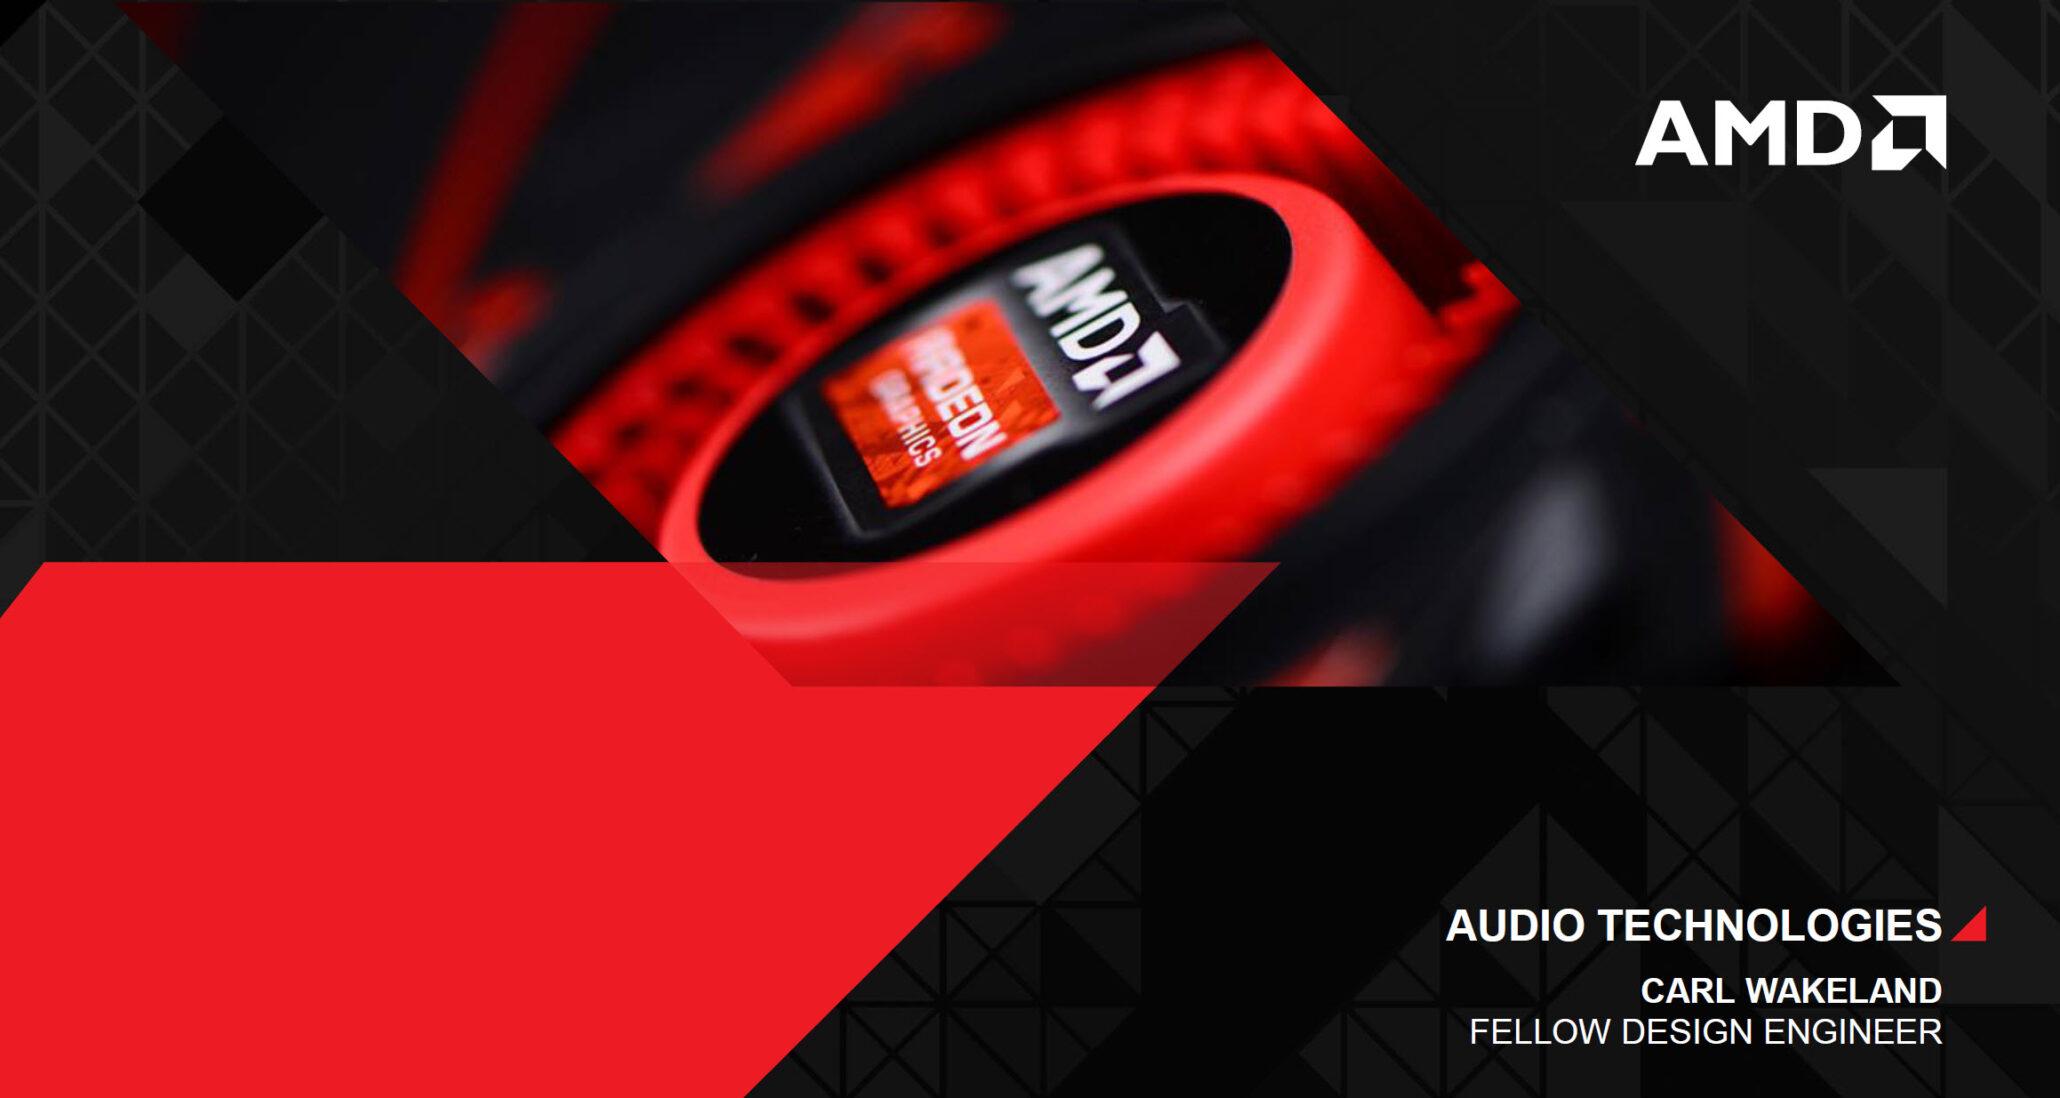 amd-audio-technologies